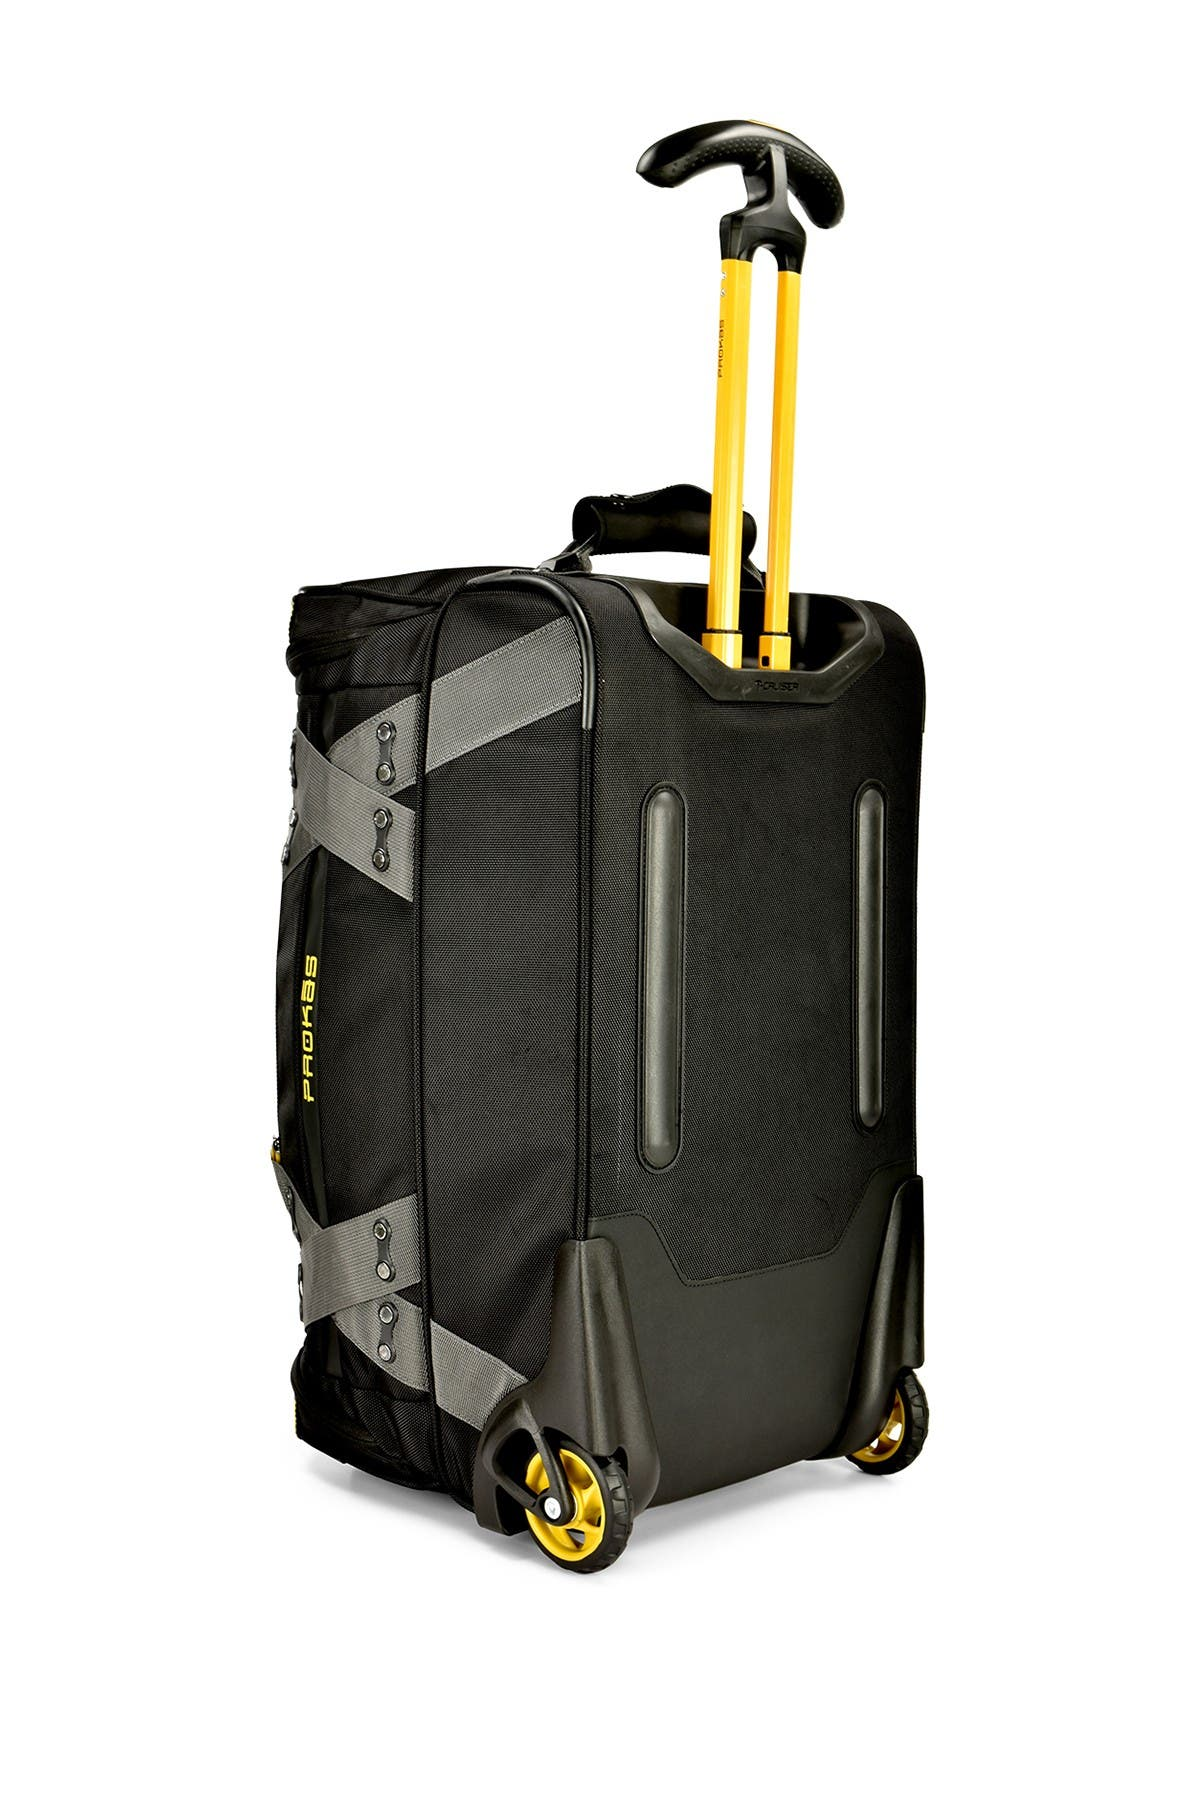 "Image of Traveler's Choice Luggage 22"" Prokas Rolling Duffel Bag"